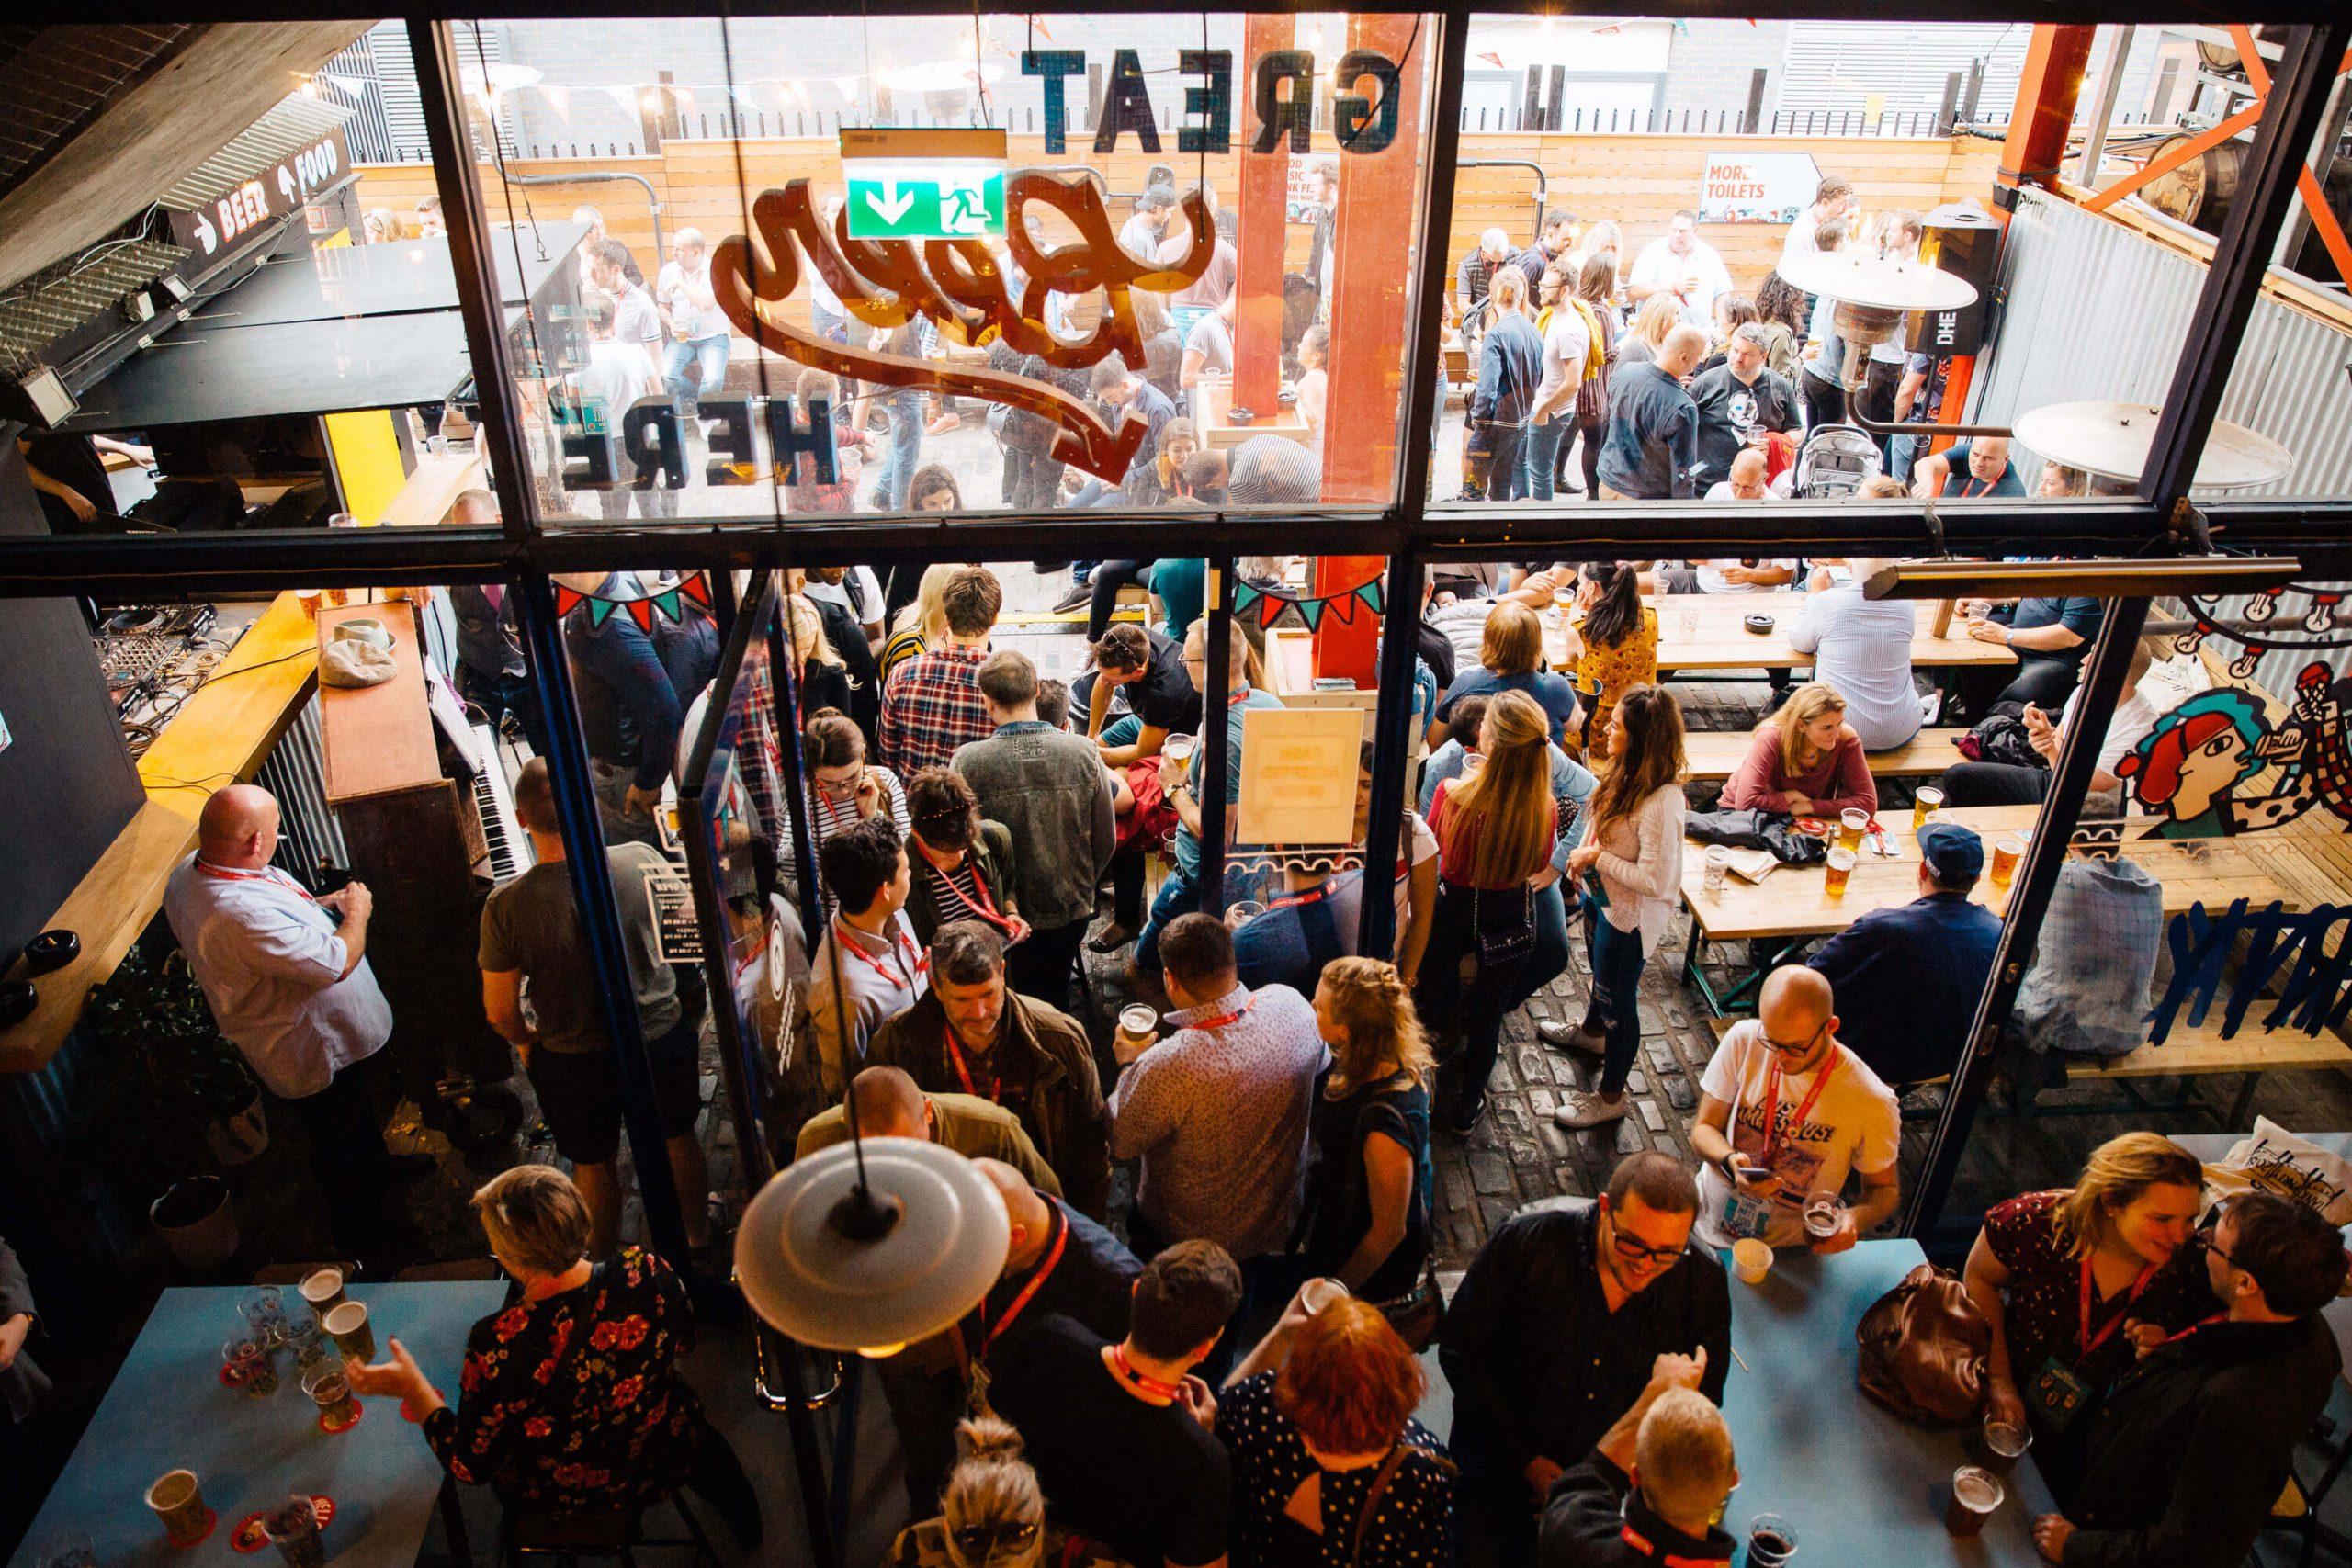 Inside the Camden Town Brewery brewpub in London, United Kingdom